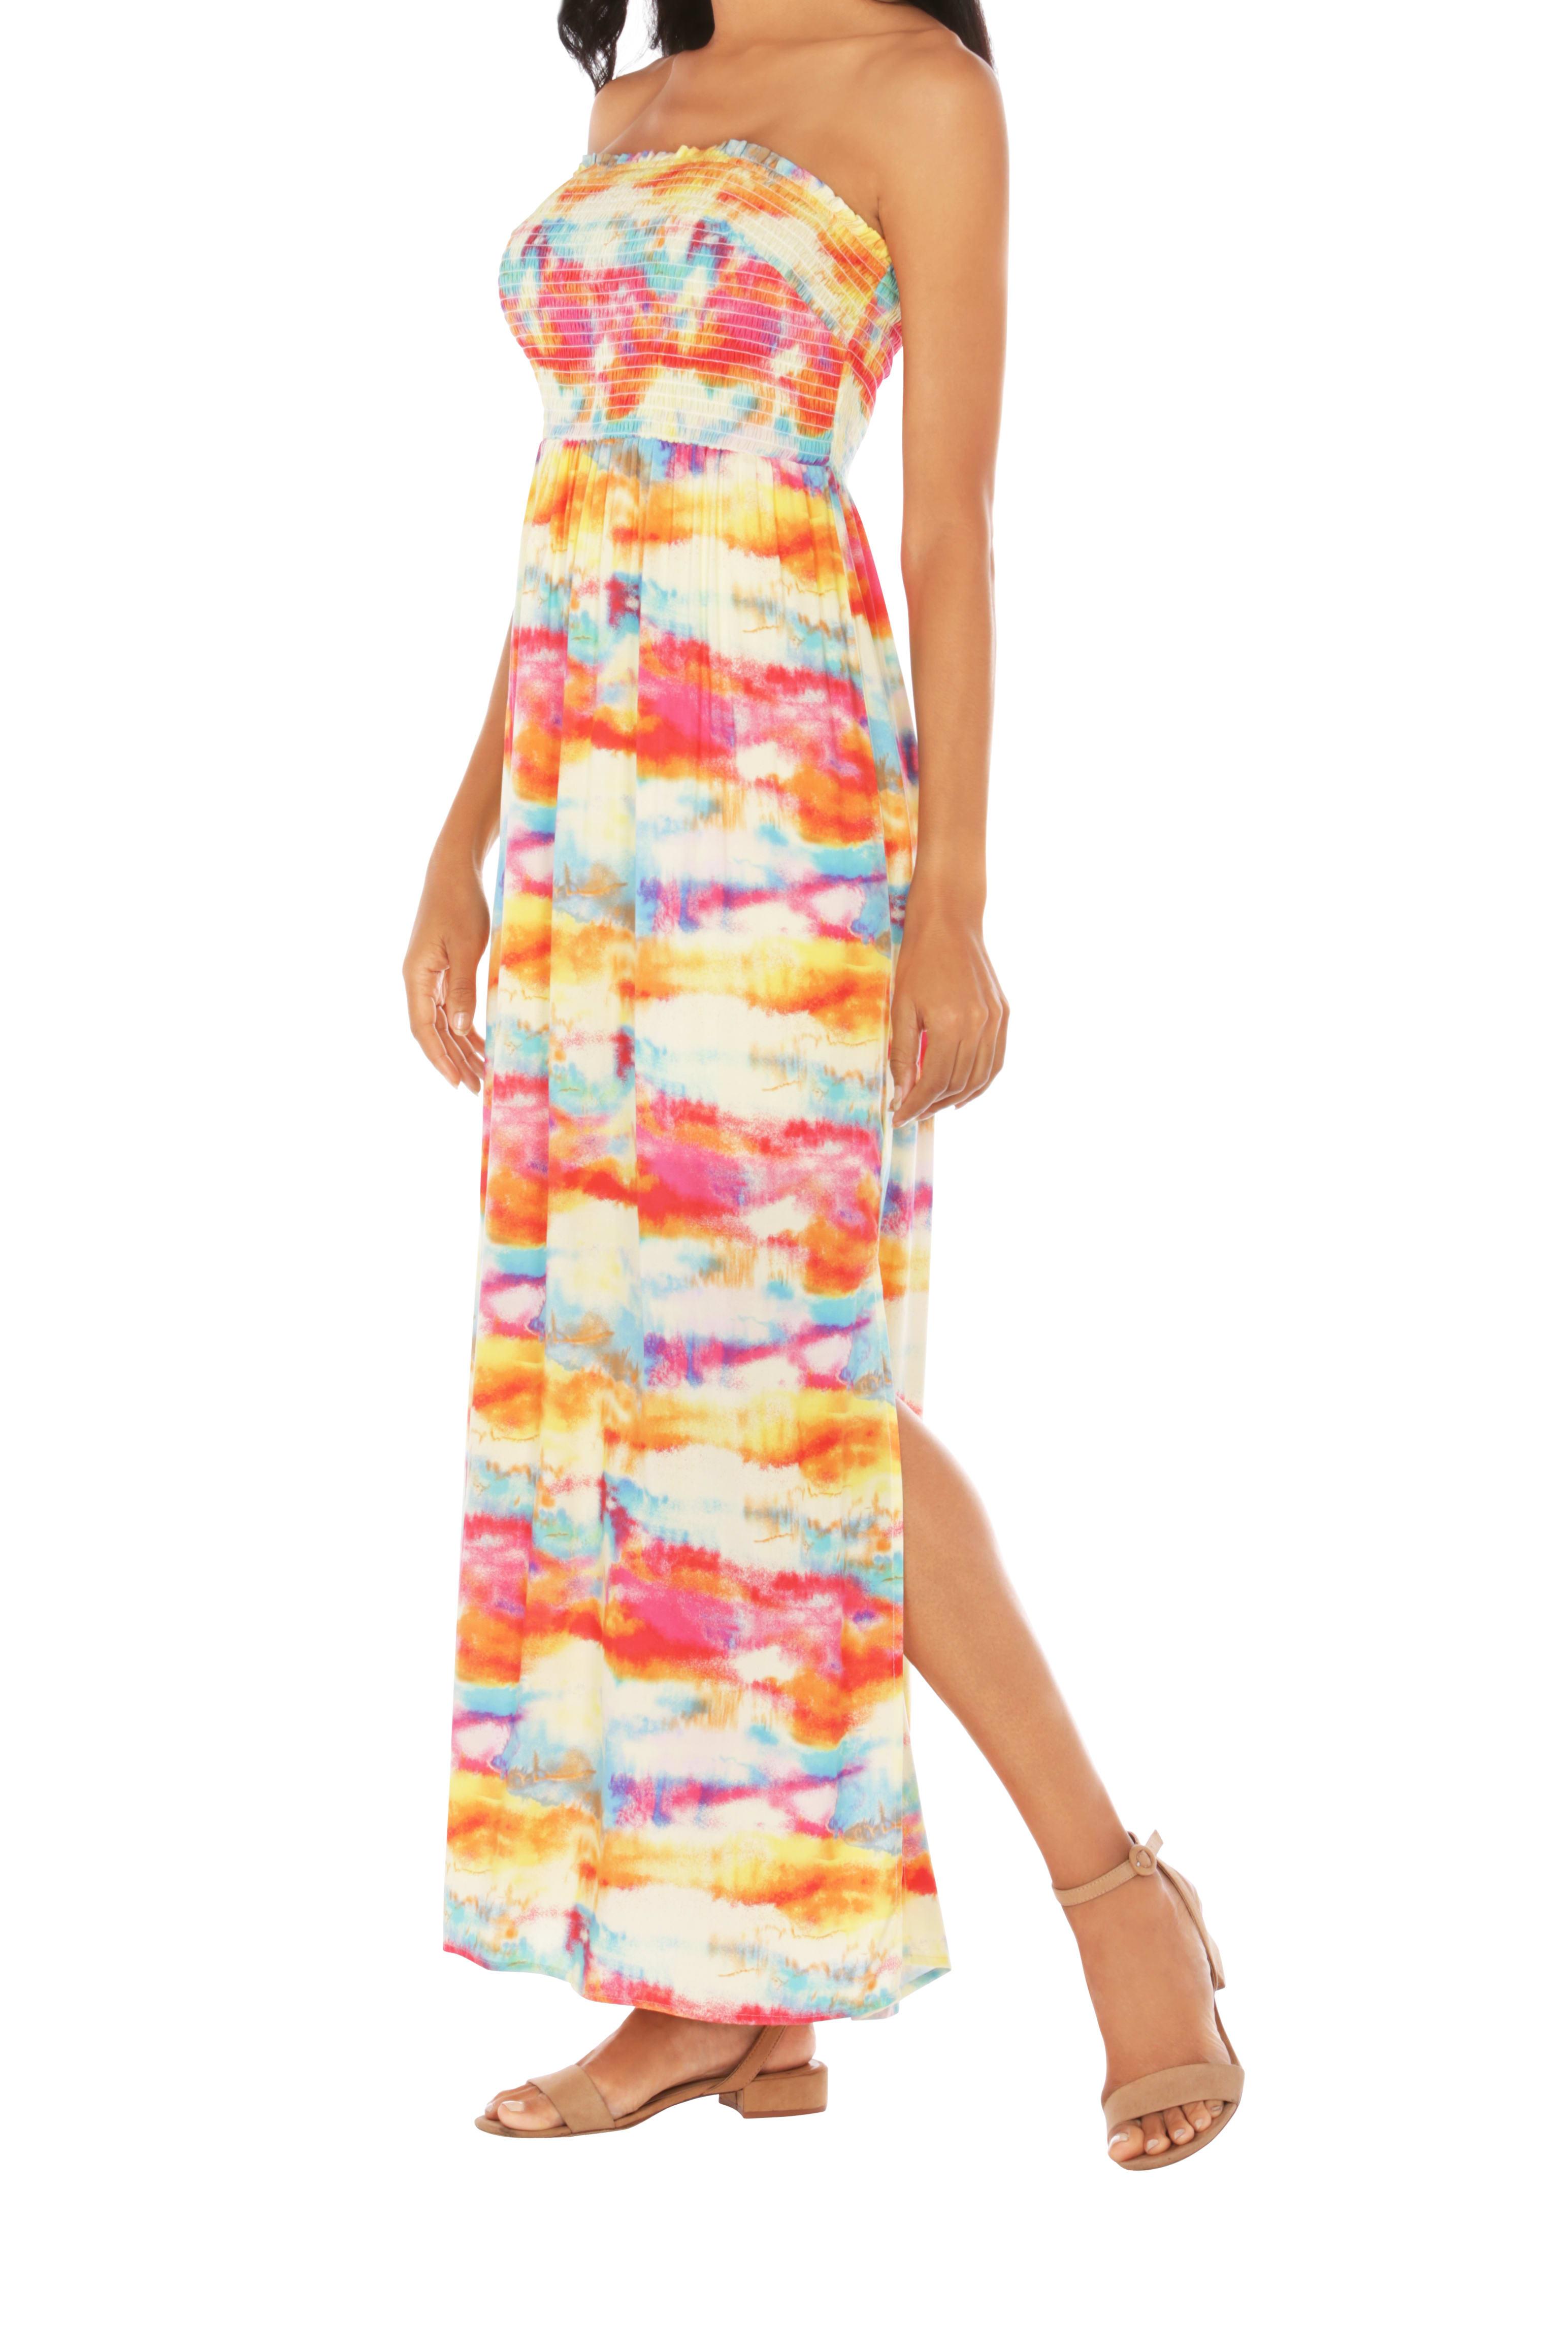 Caribbean Joe® Smocked Maxi Dress - Saffron - Detail